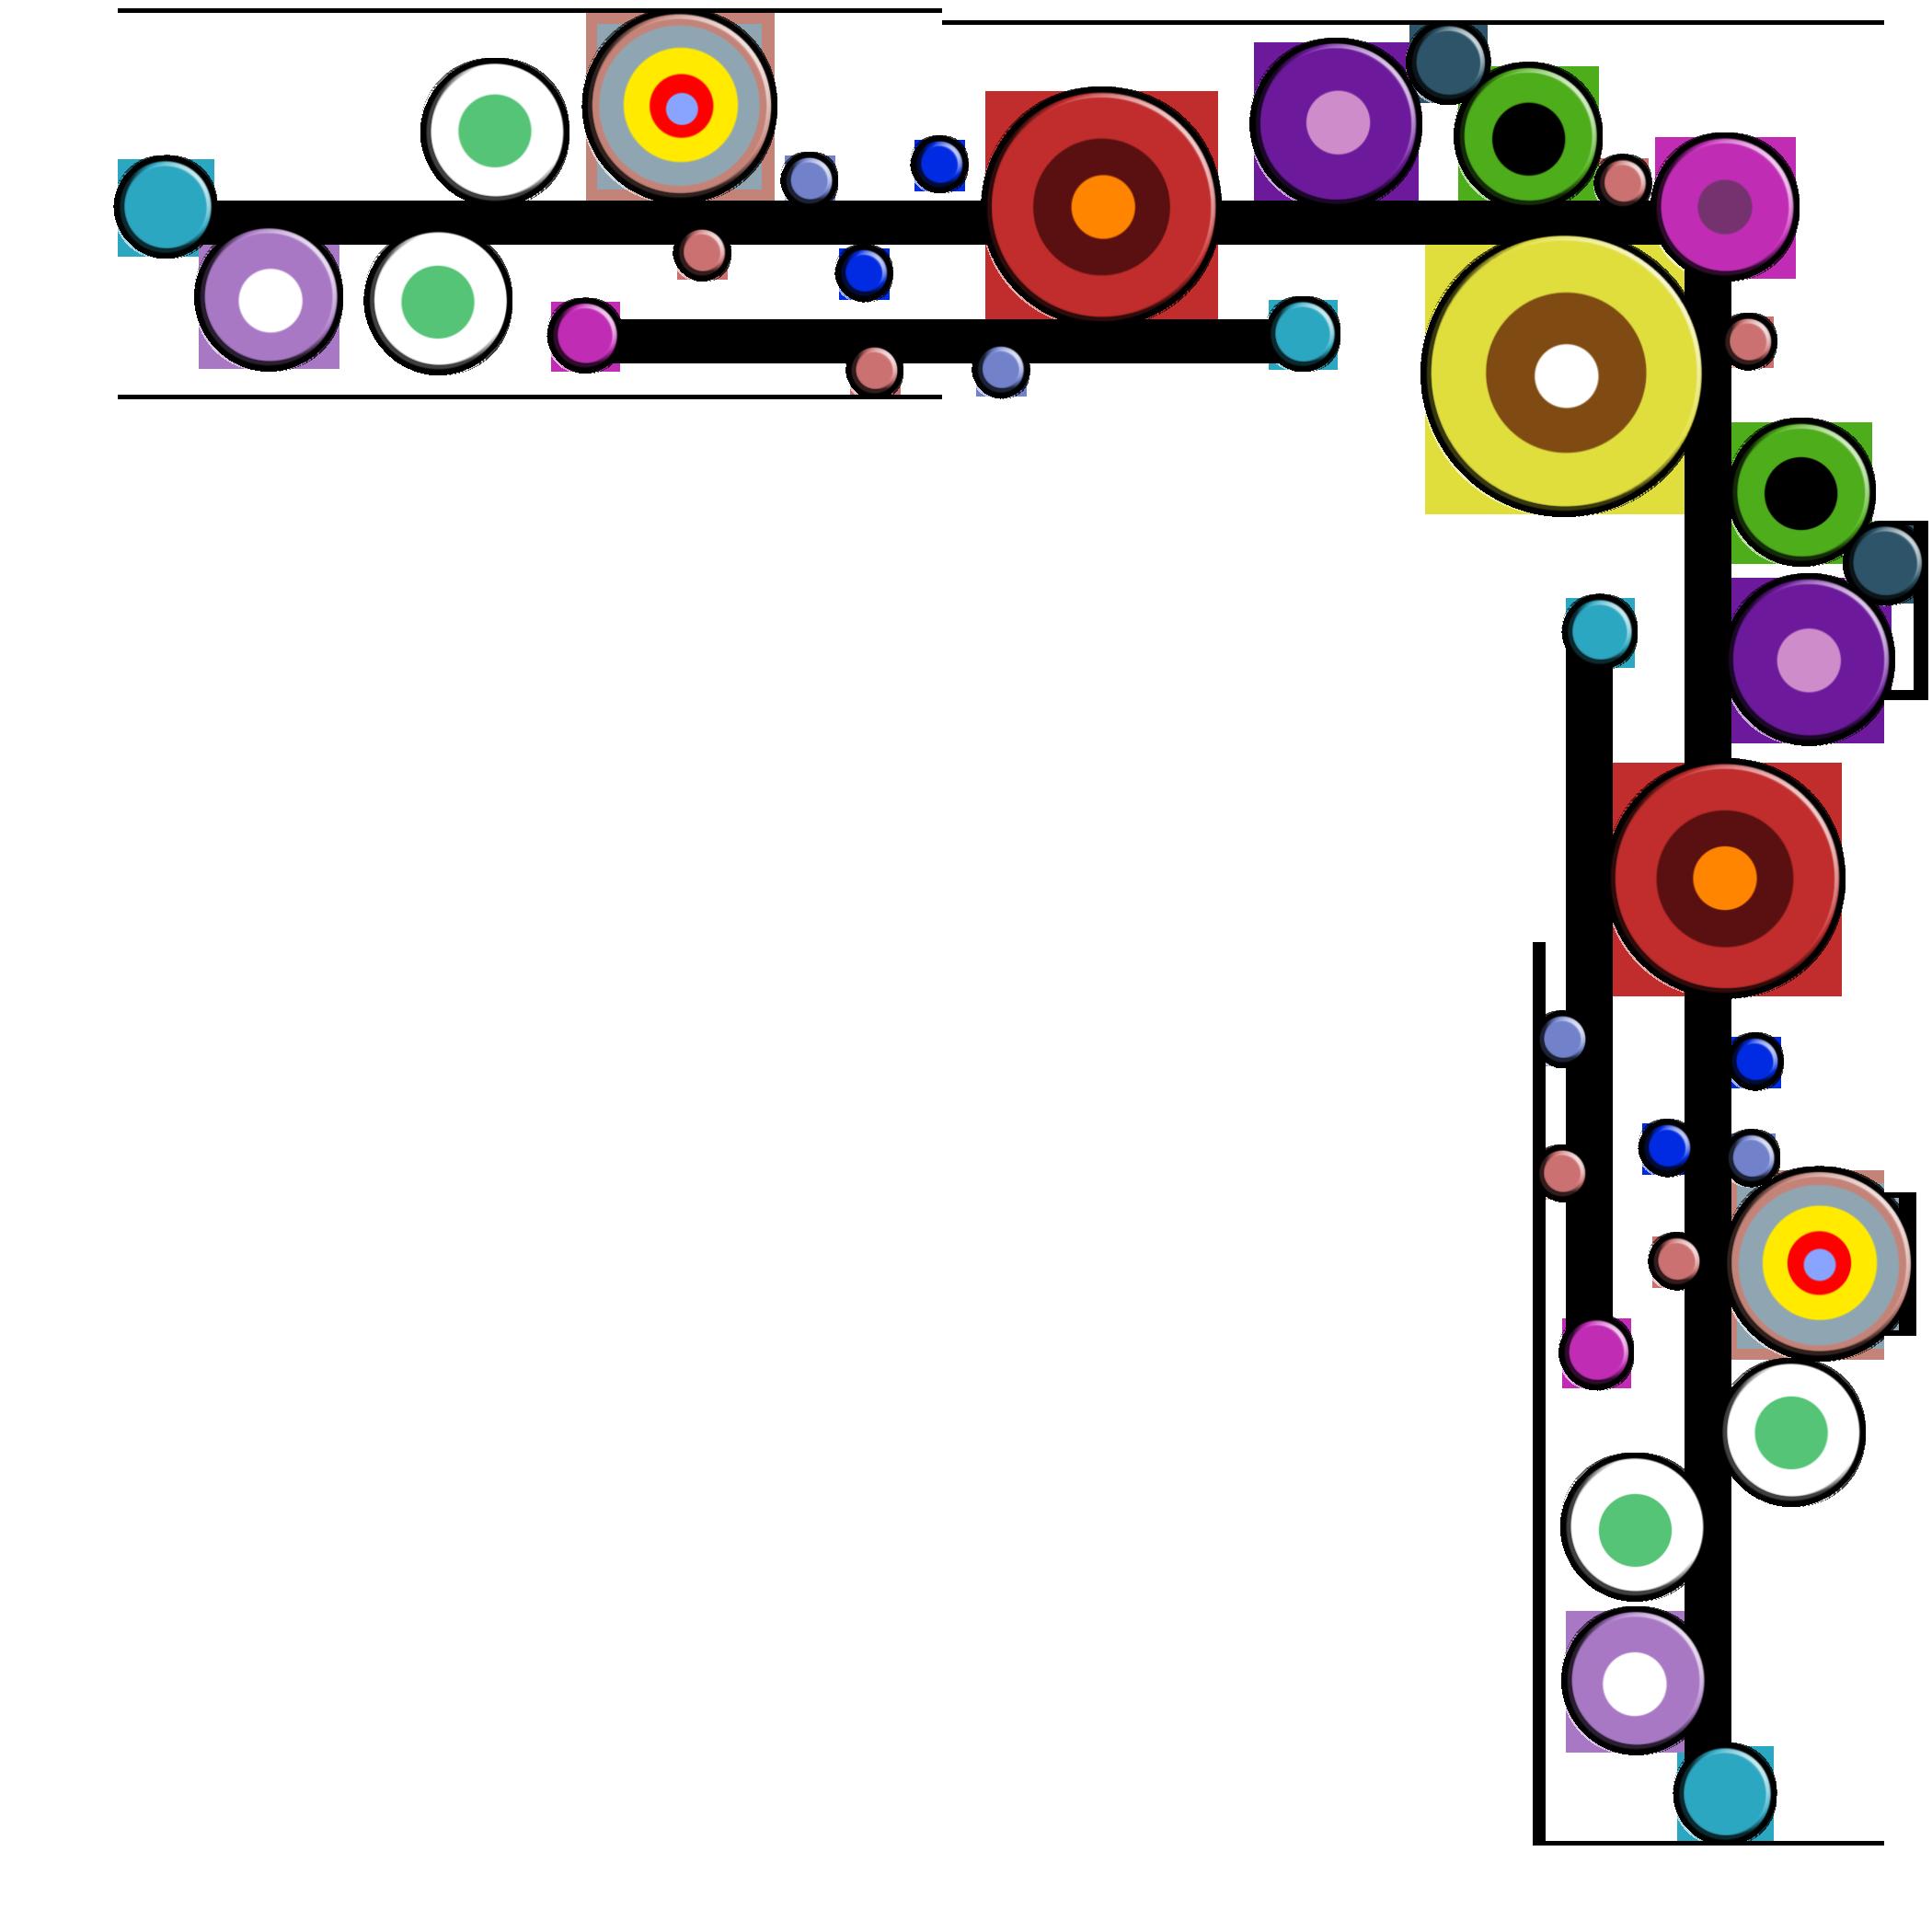 emboss retro target circle dots corner border frame even